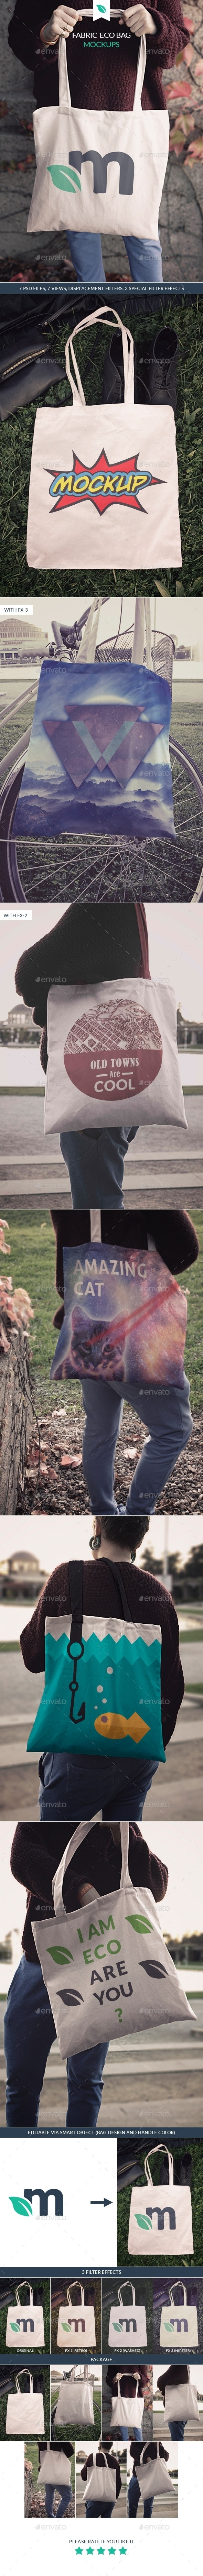 Tote Bag Mockups - Miscellaneous Apparel